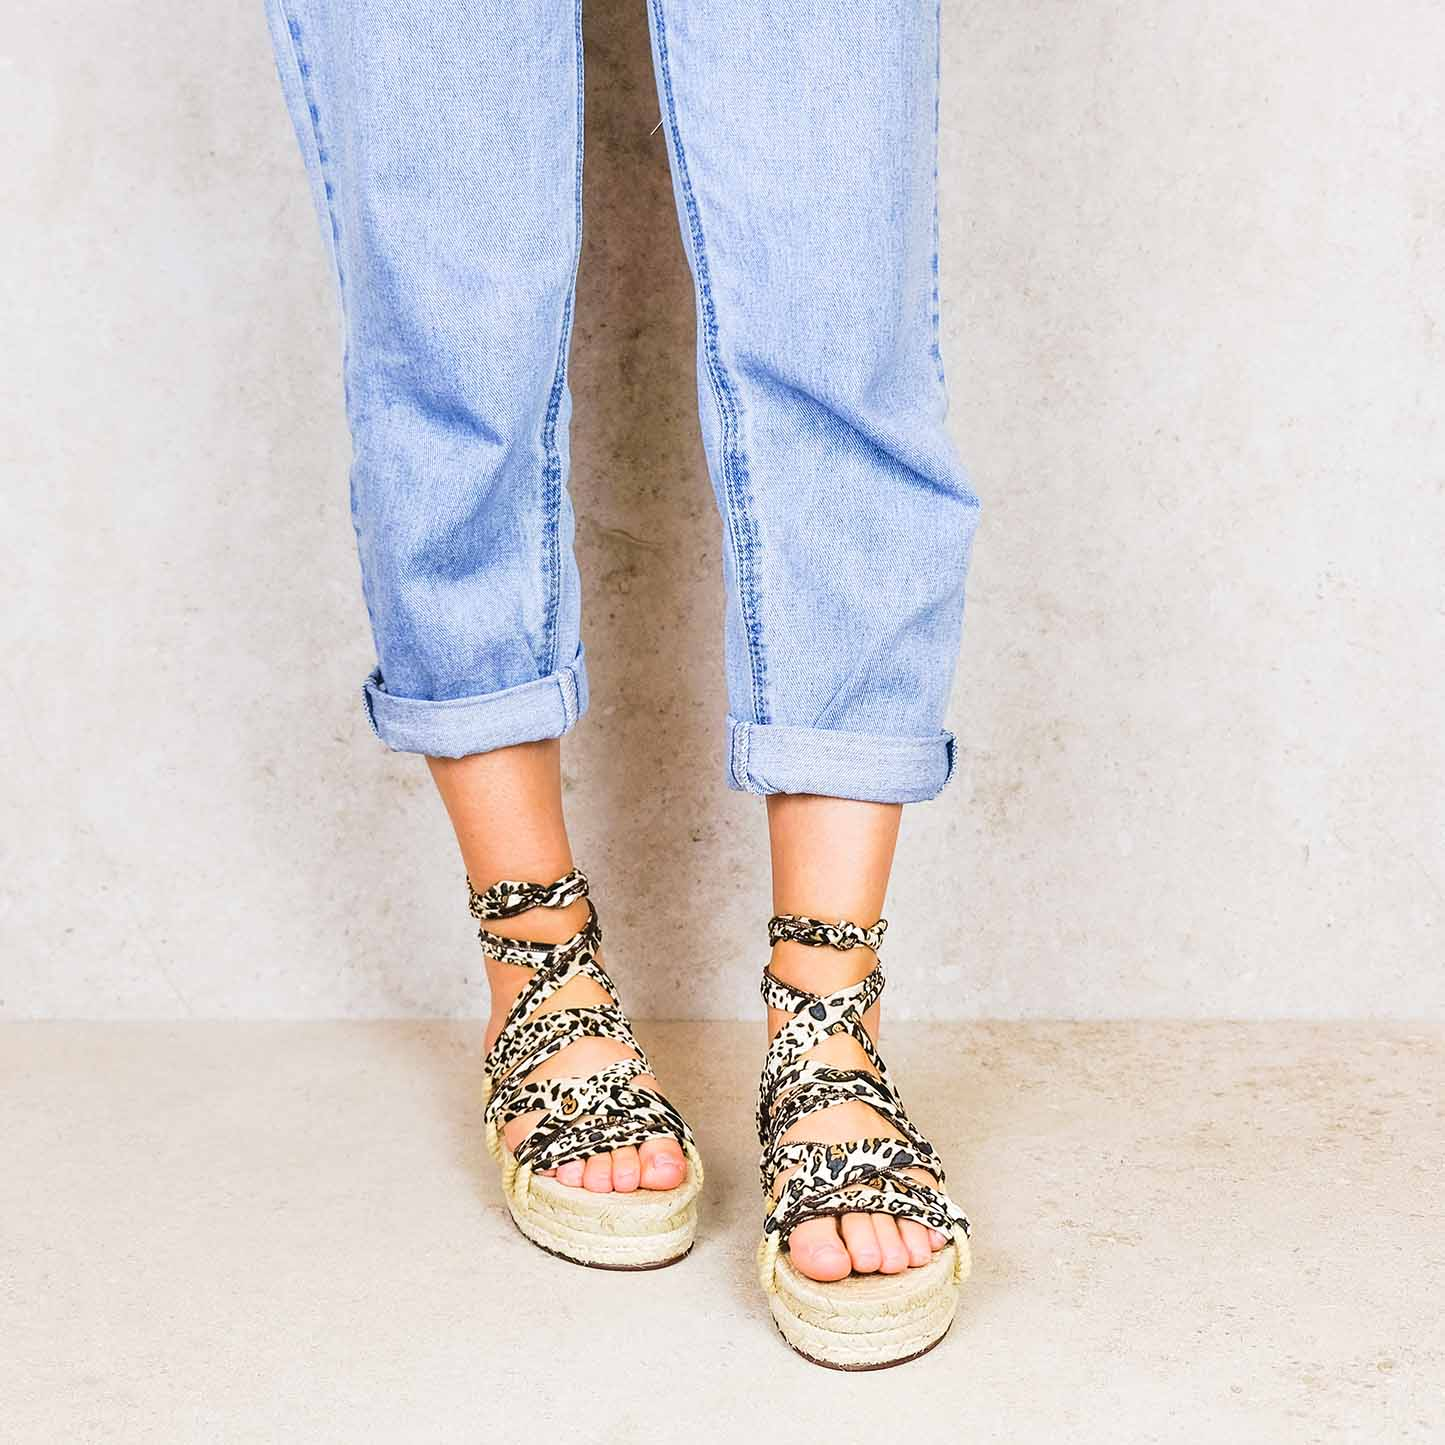 Leopard-elegance ribbons linten lintsandalen sandals travelsandals vegan sustainable sandals wikkelsandalen